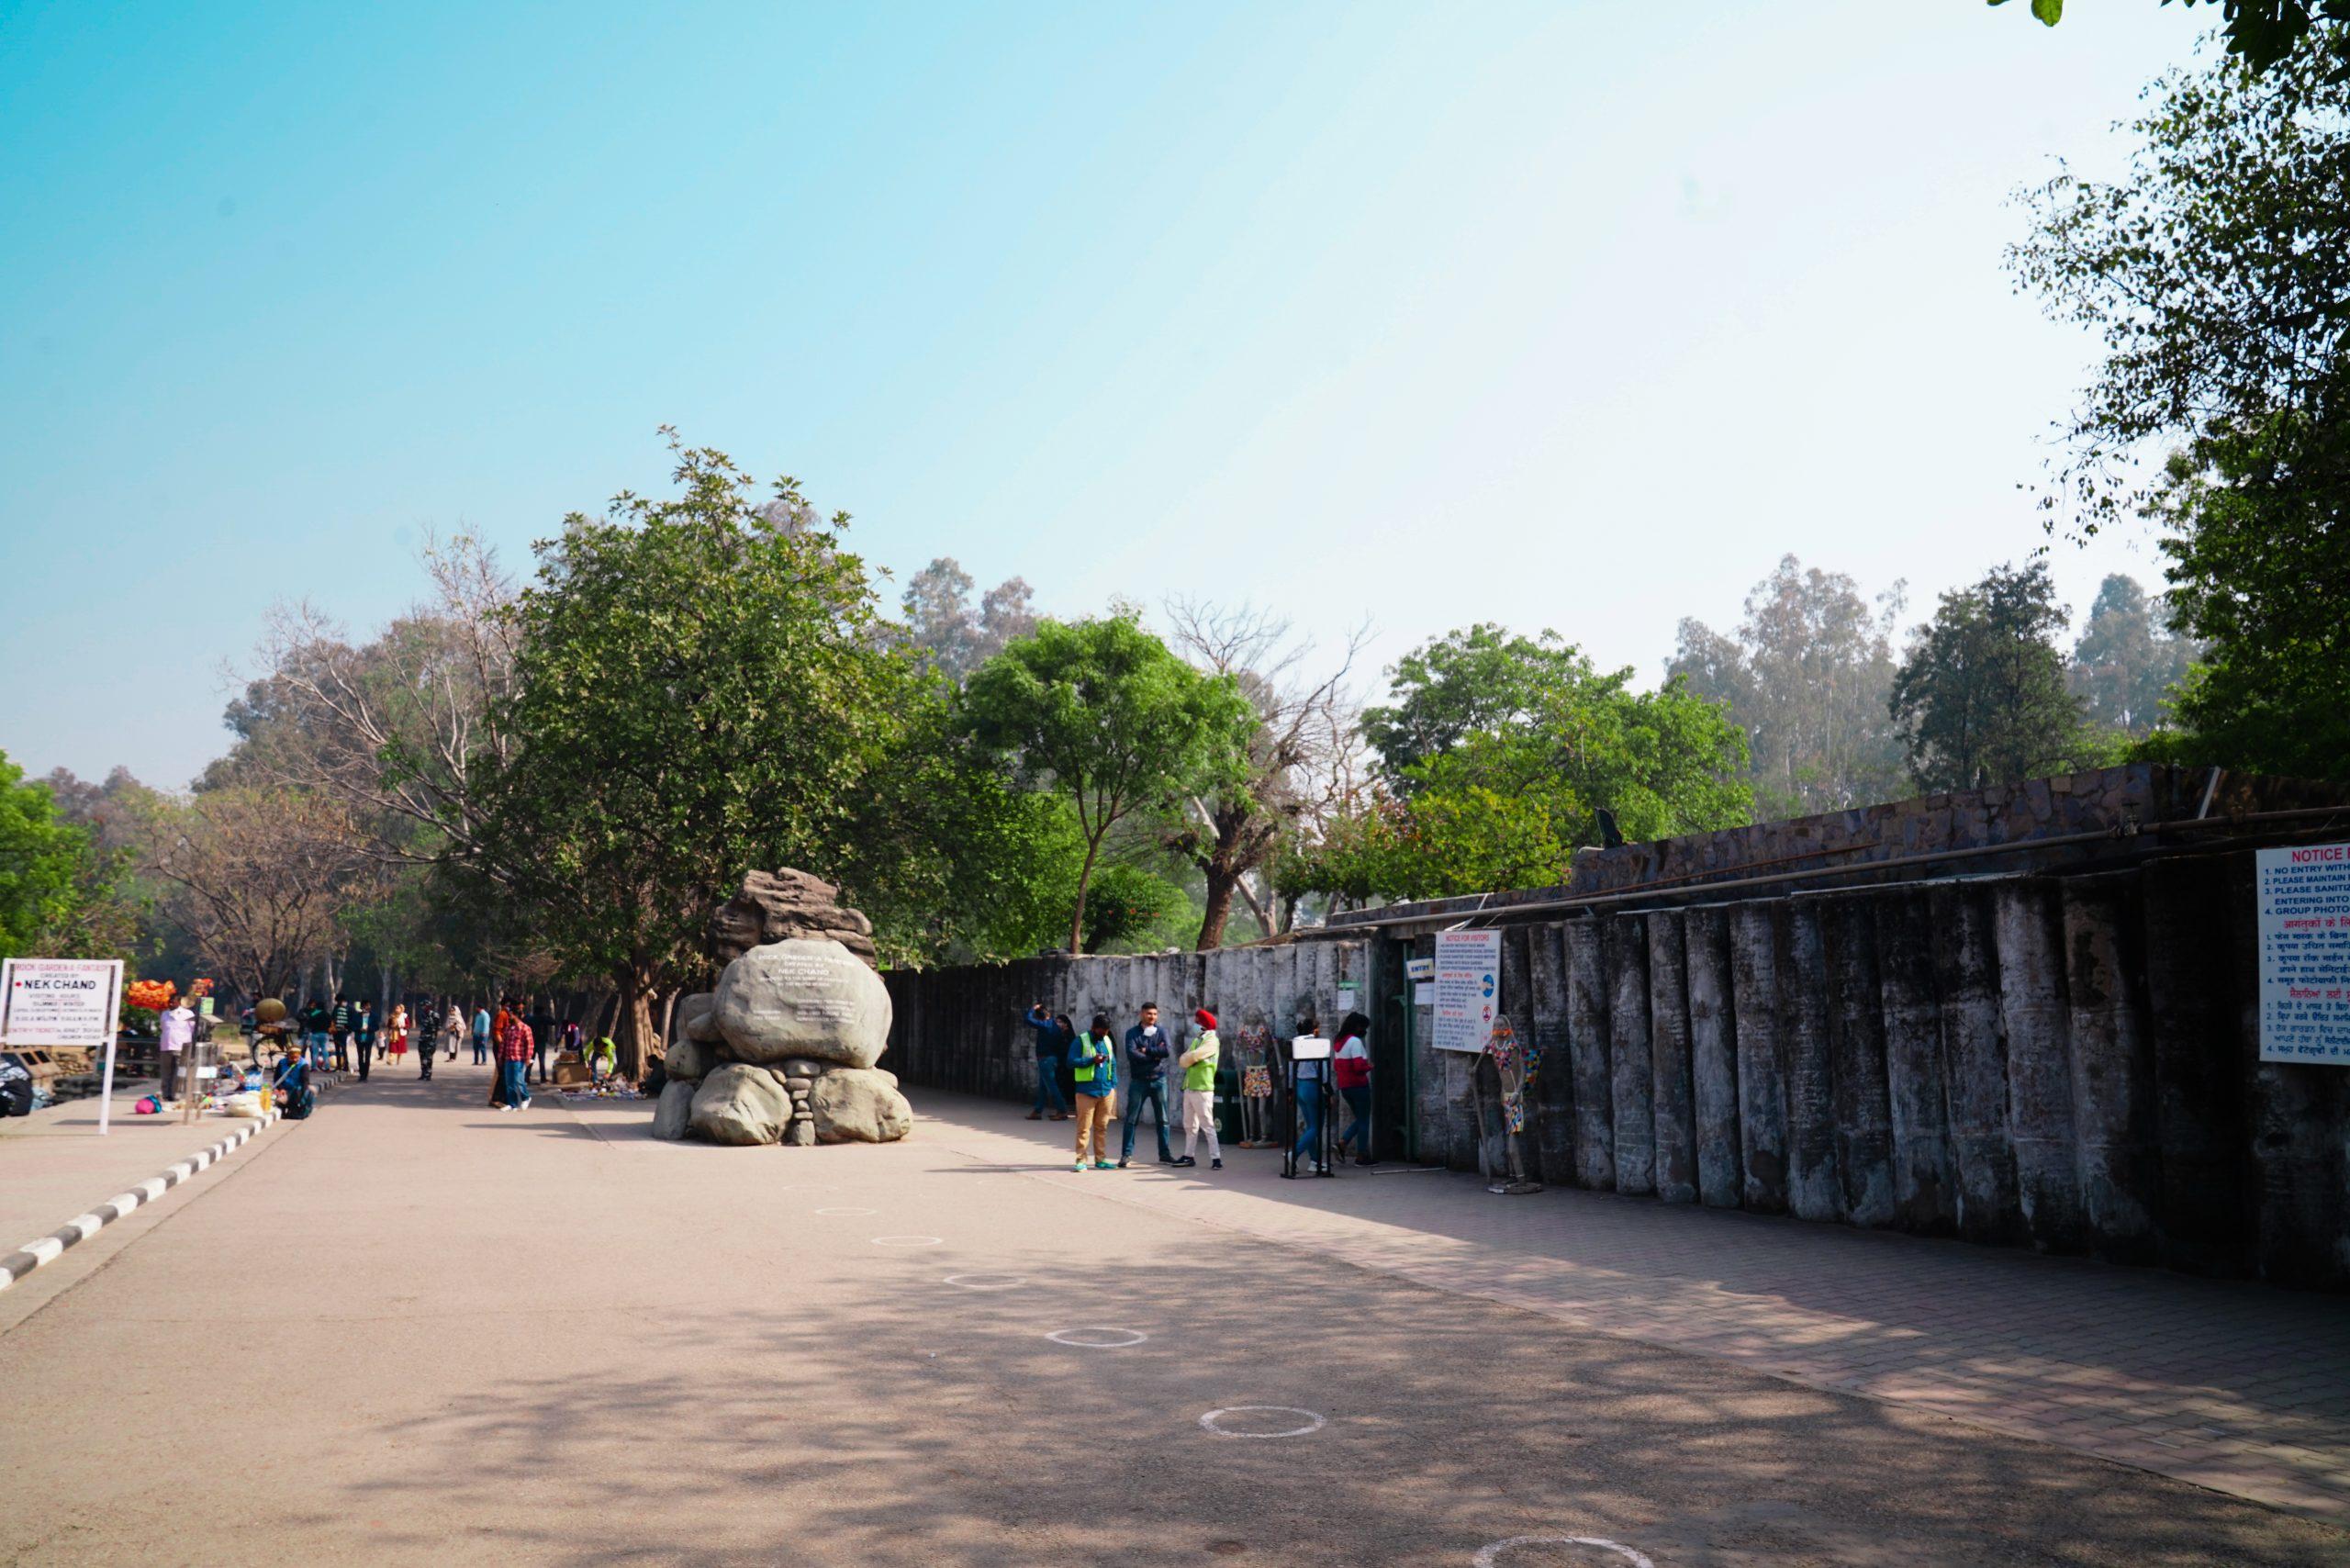 Entrance of Rock Garden in Chandigarh